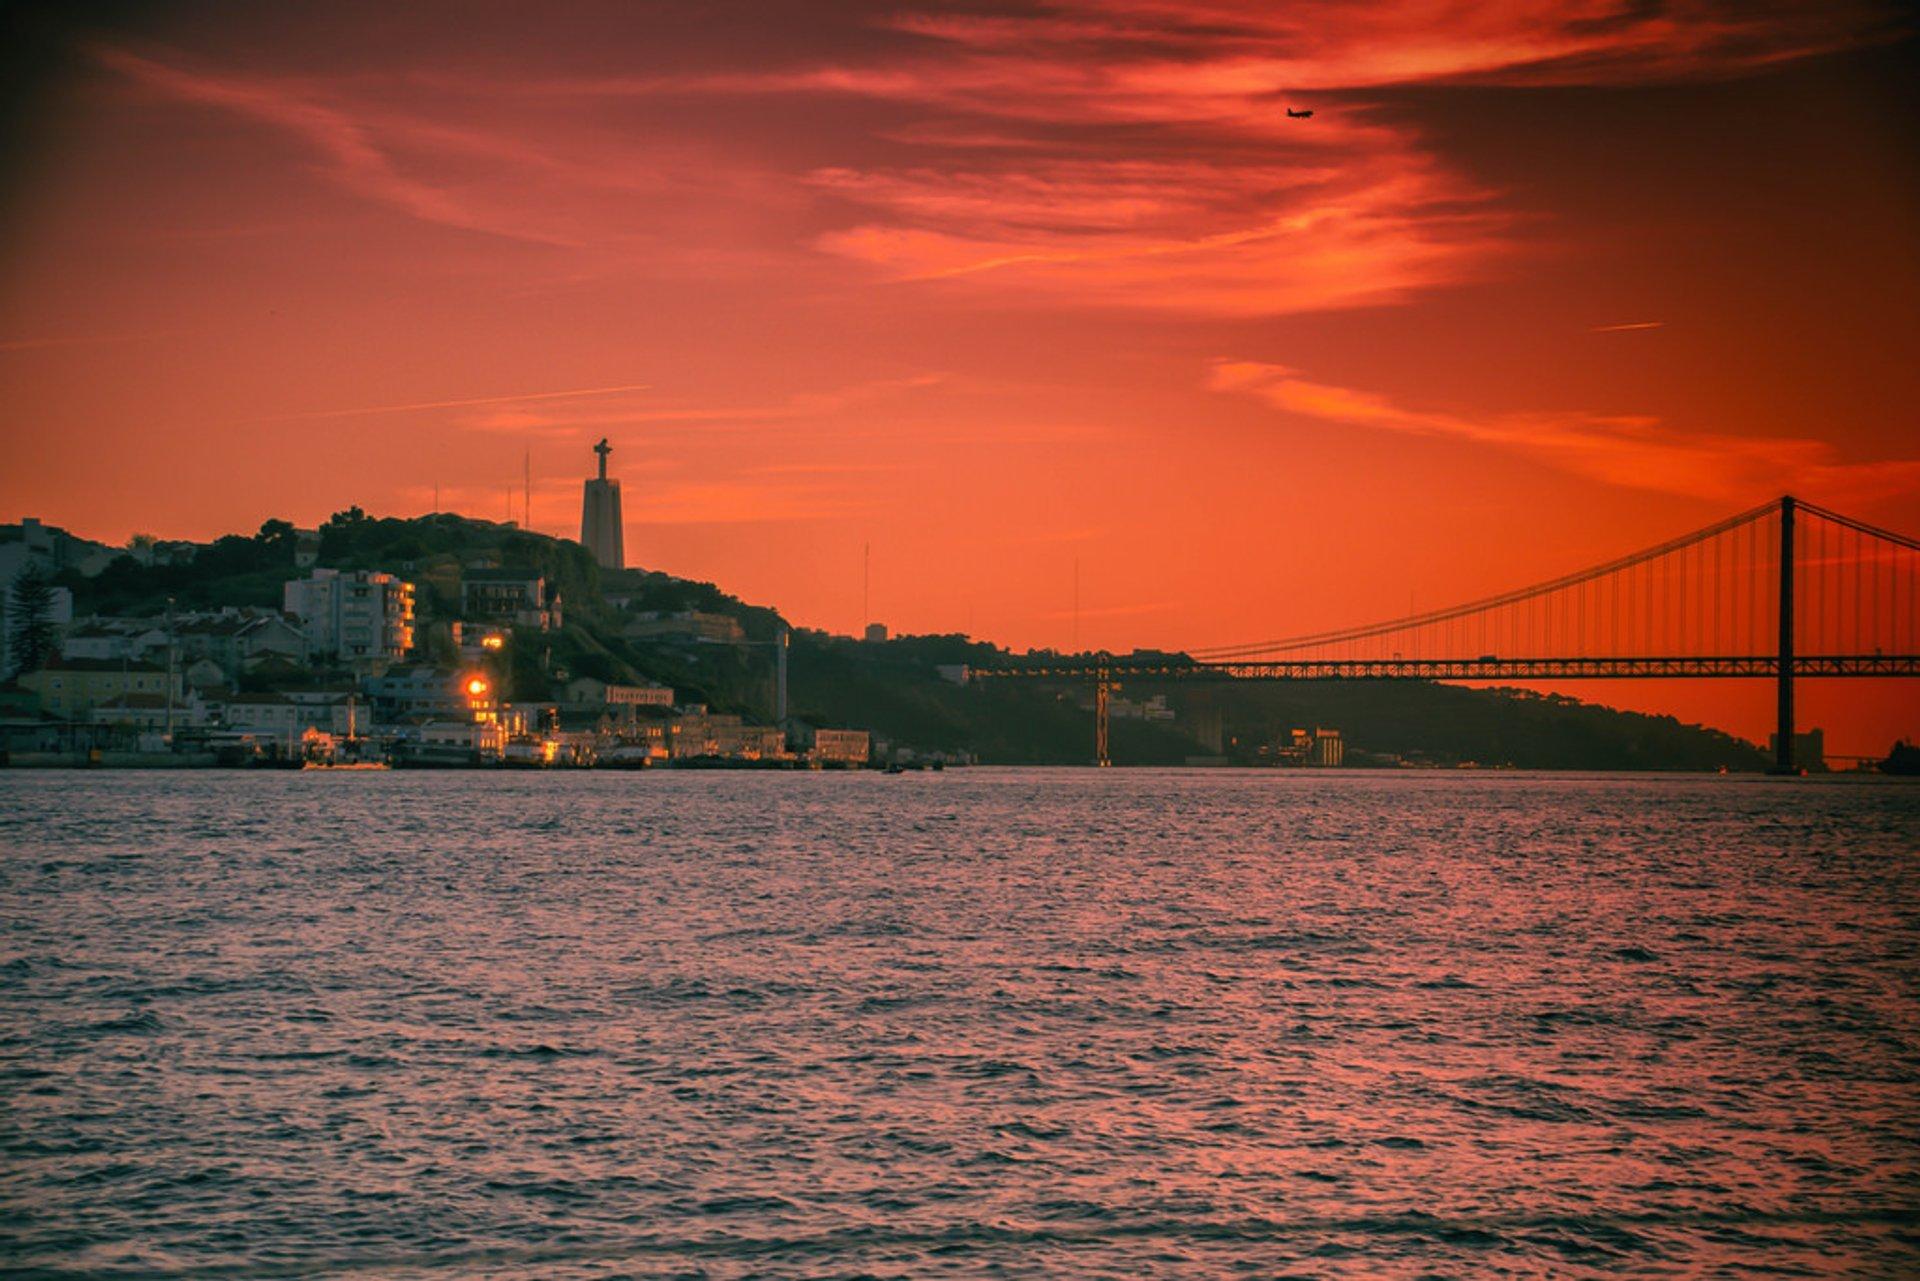 Tagus River Sunset Cruise in Lisbon - Best Season 2019